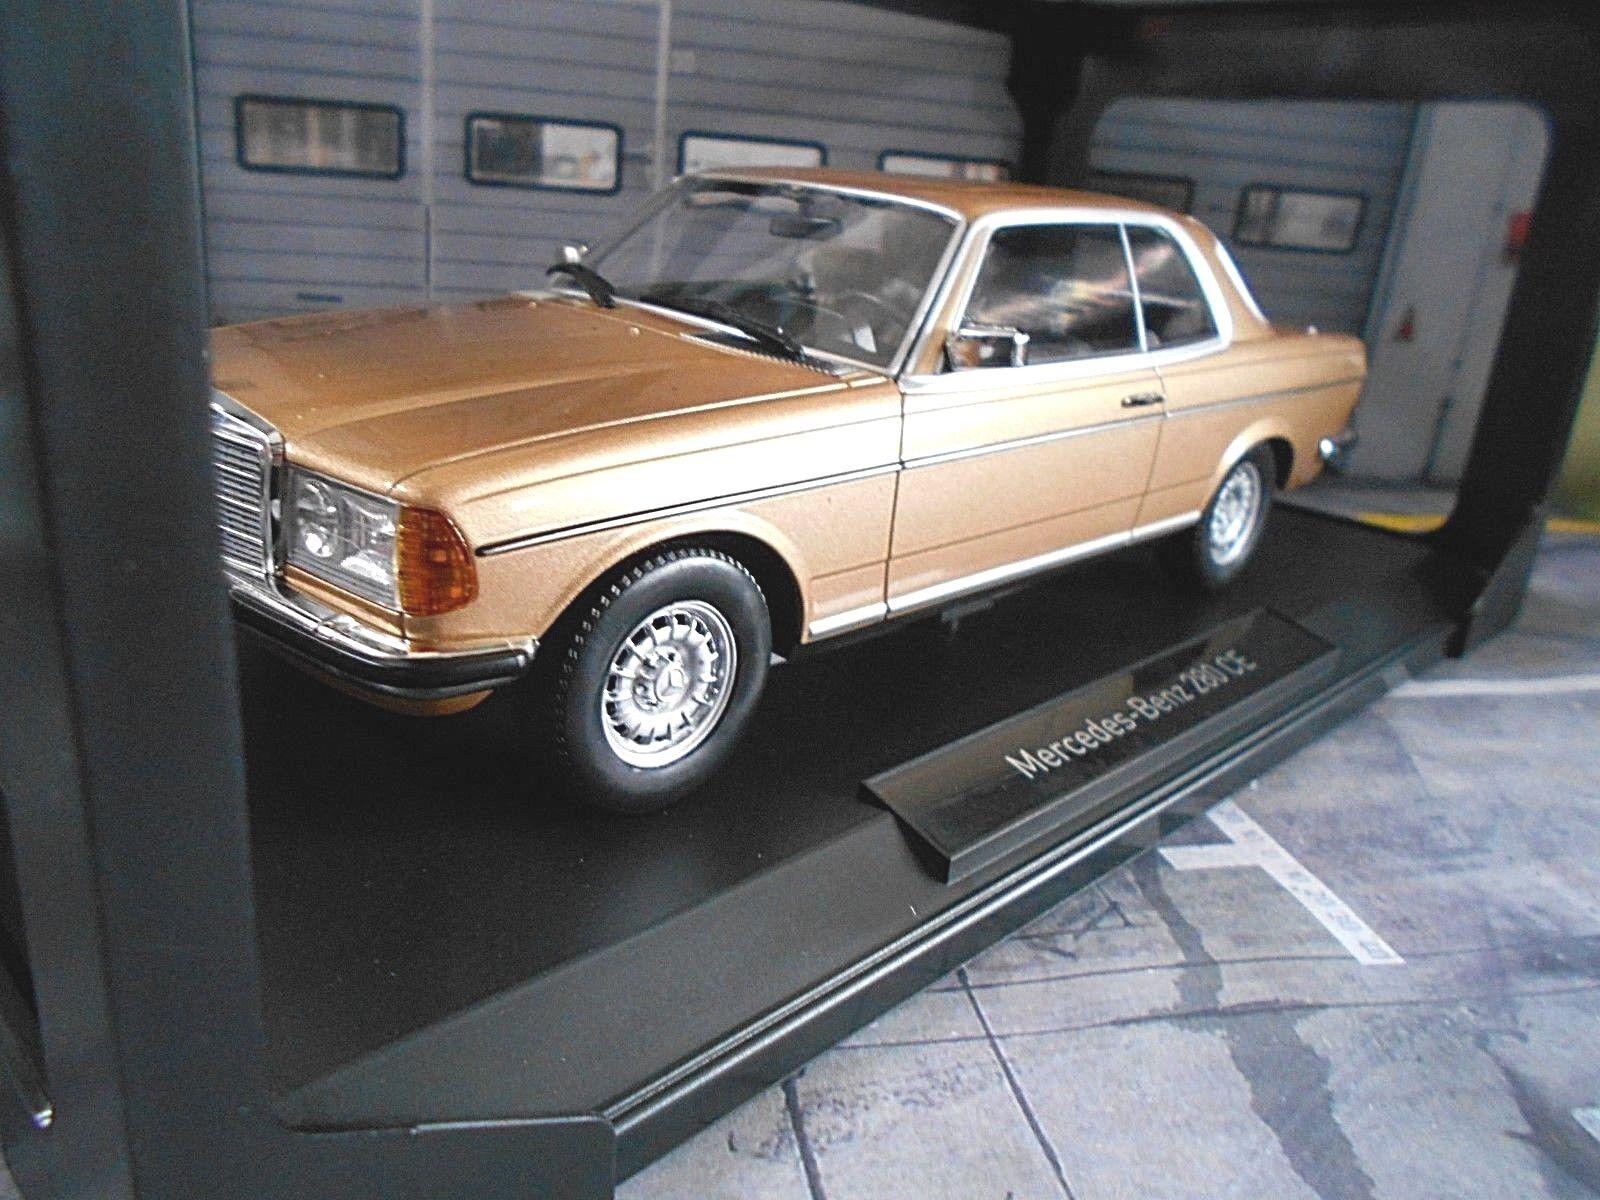 MERCEDES W123 Coupe 280 C123 E klasse gold golden golden golden 1977 - 1982 Norev RAR 1 18 a4f991